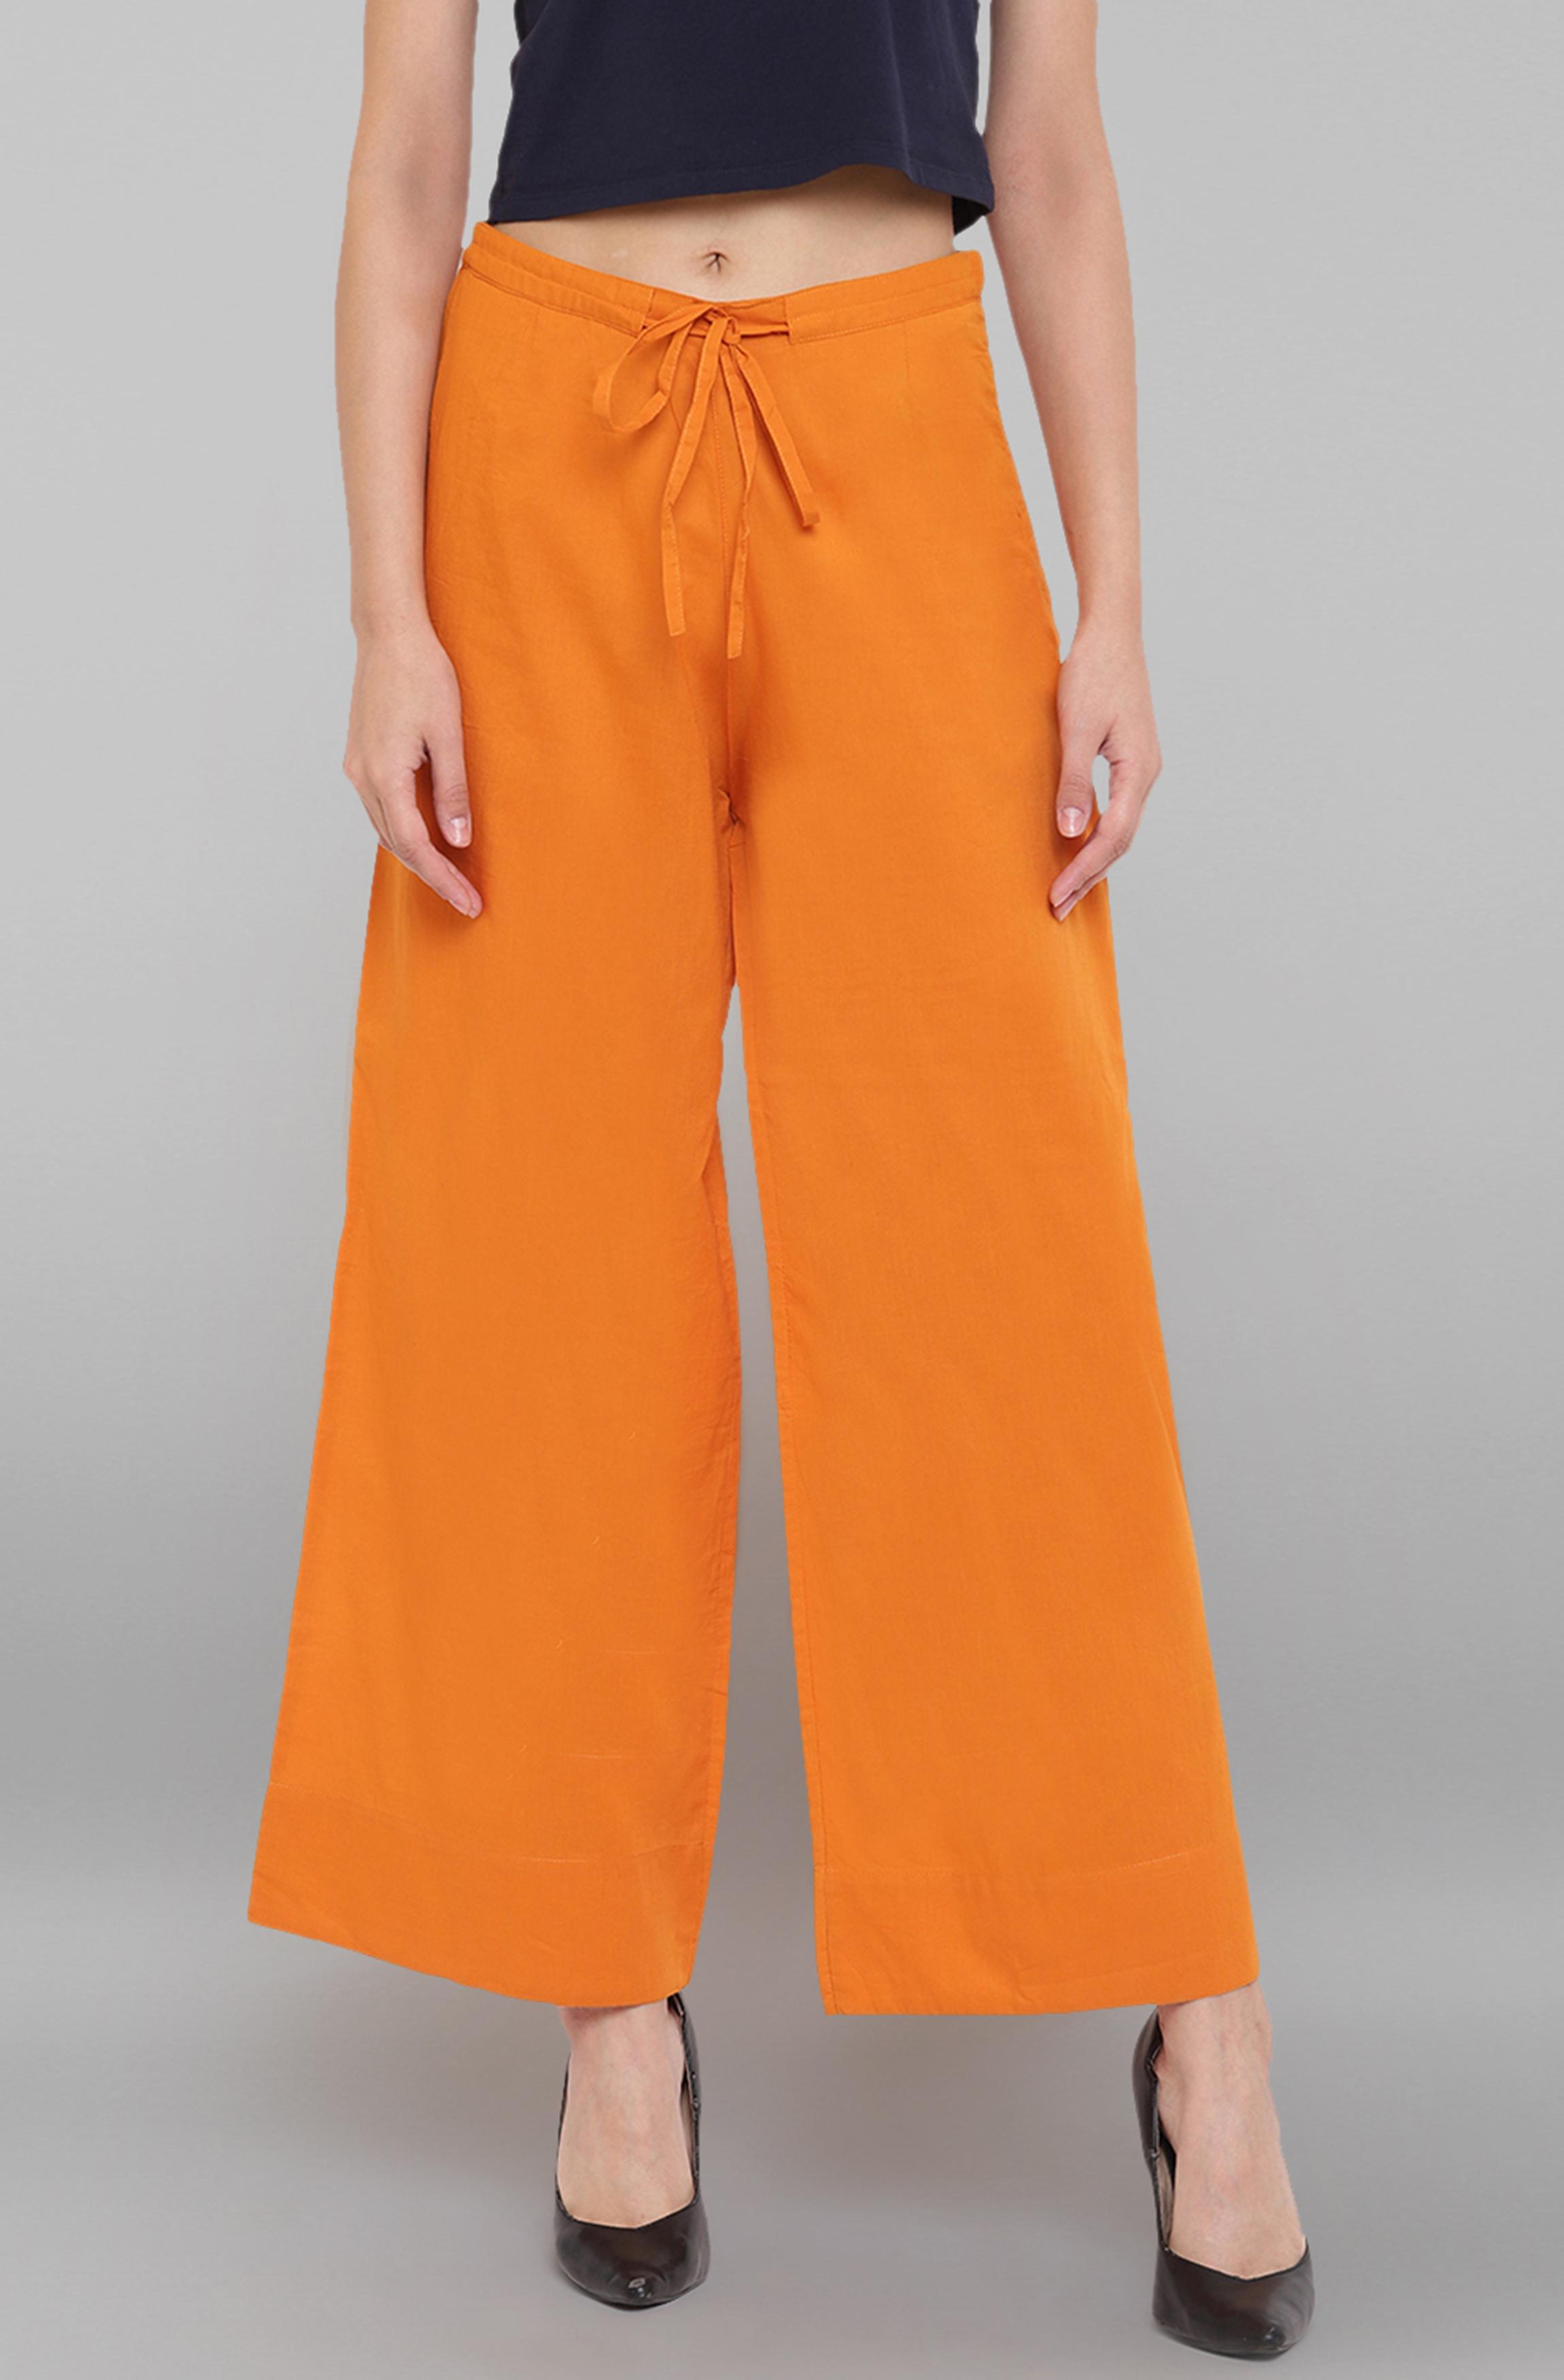 Janasya | Janasya Women's Orange Pure Cotton Palazzo Pant